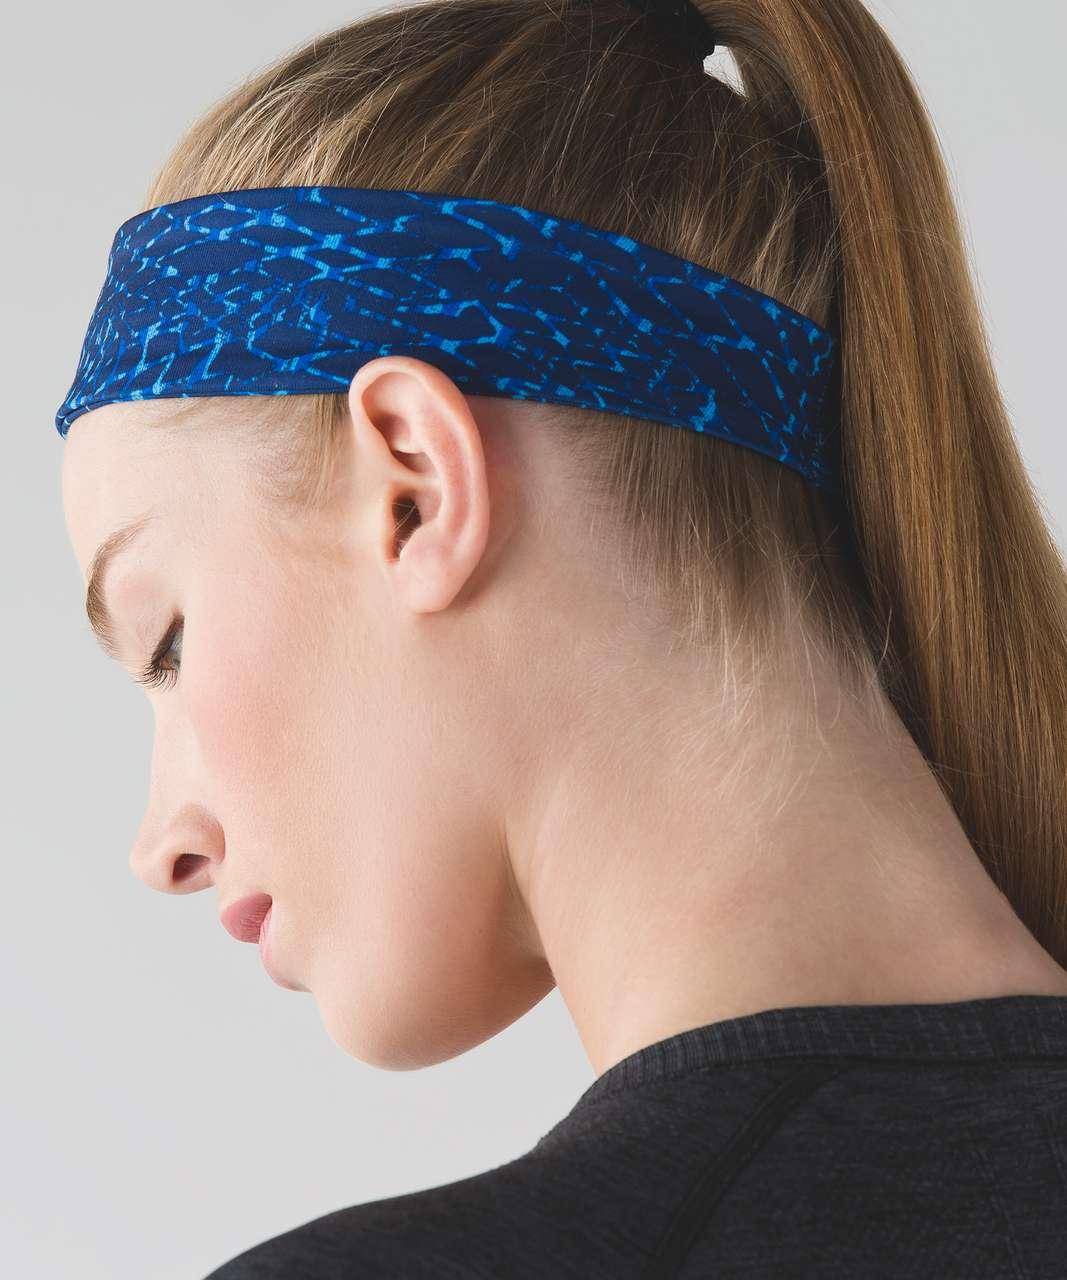 Lululemon Fly Away Tamer Headband 2.0 - Samba Snake Kayak Blue Hero Blue